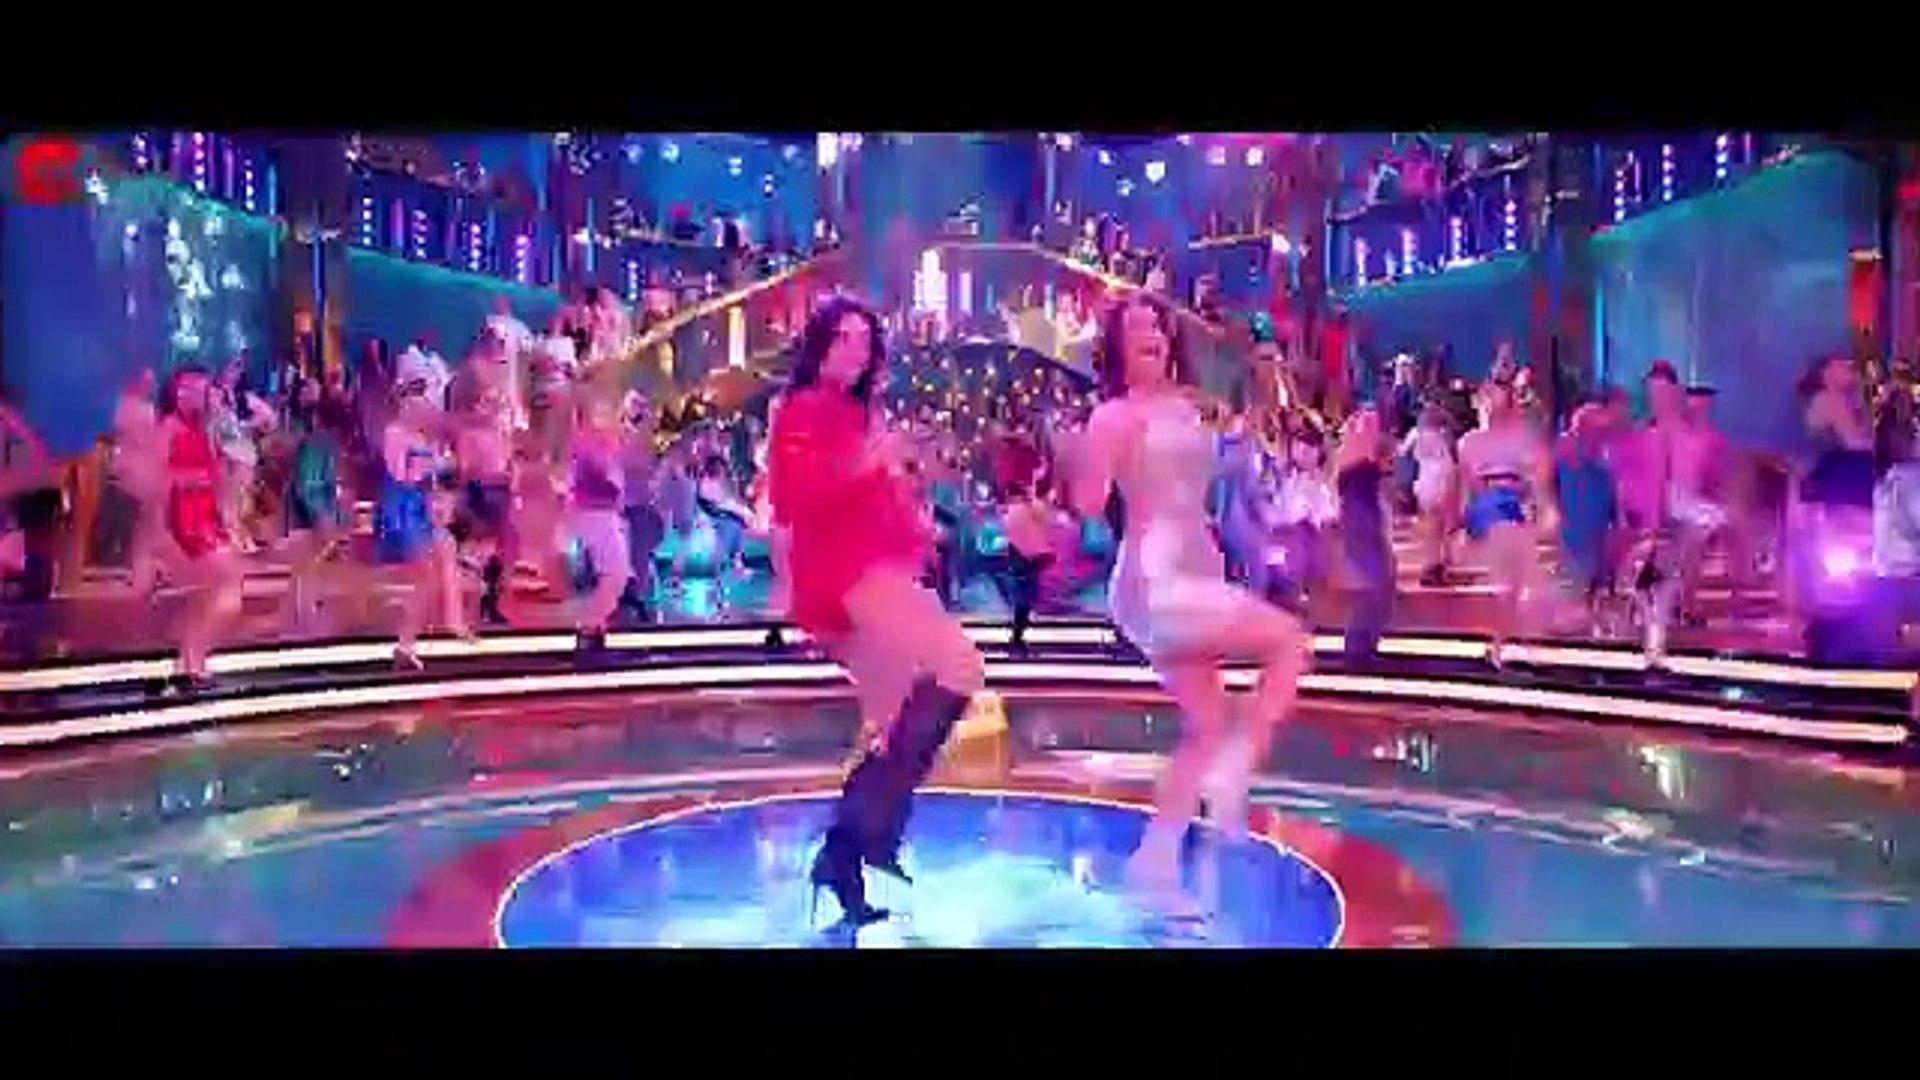 Dila De Ghar Bana De Ghar Chandigarh Mein Full Song - Good Newwz - Akshay Kumar ¦ Harrdy Sandhu | Ne